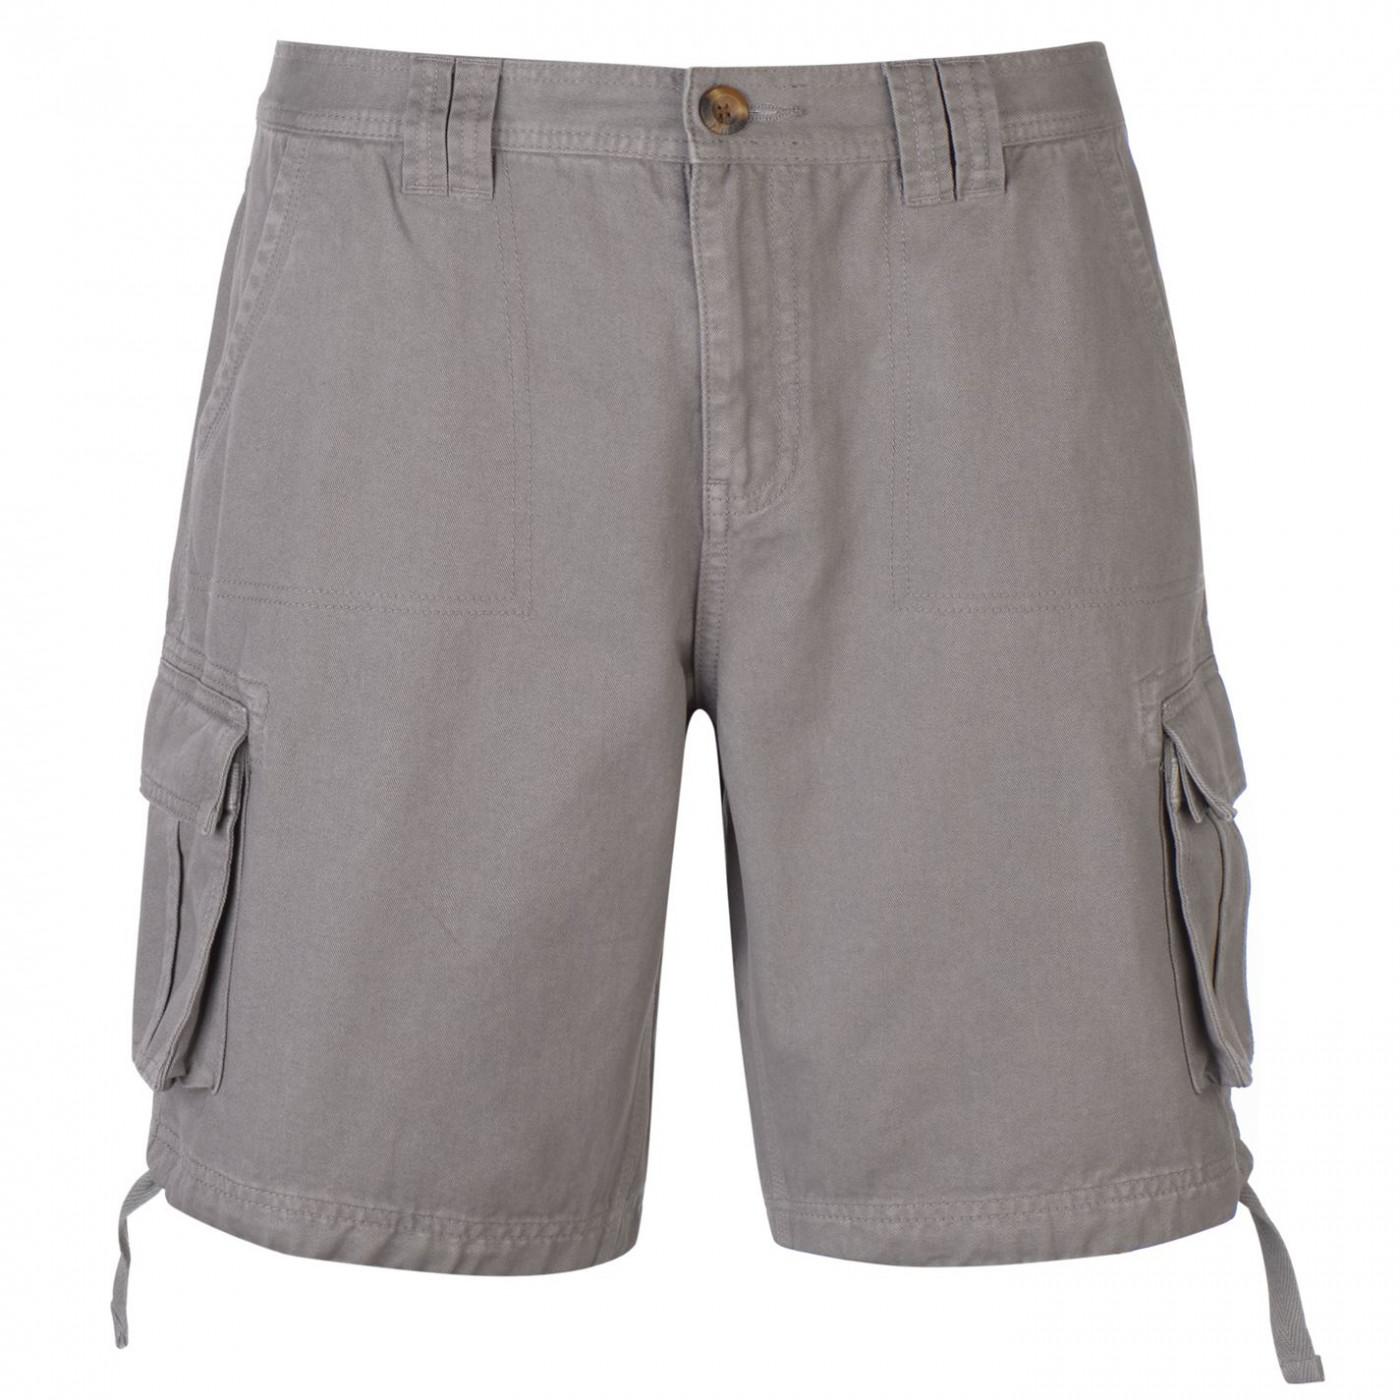 Men's shorts SoulCal Cal Utility